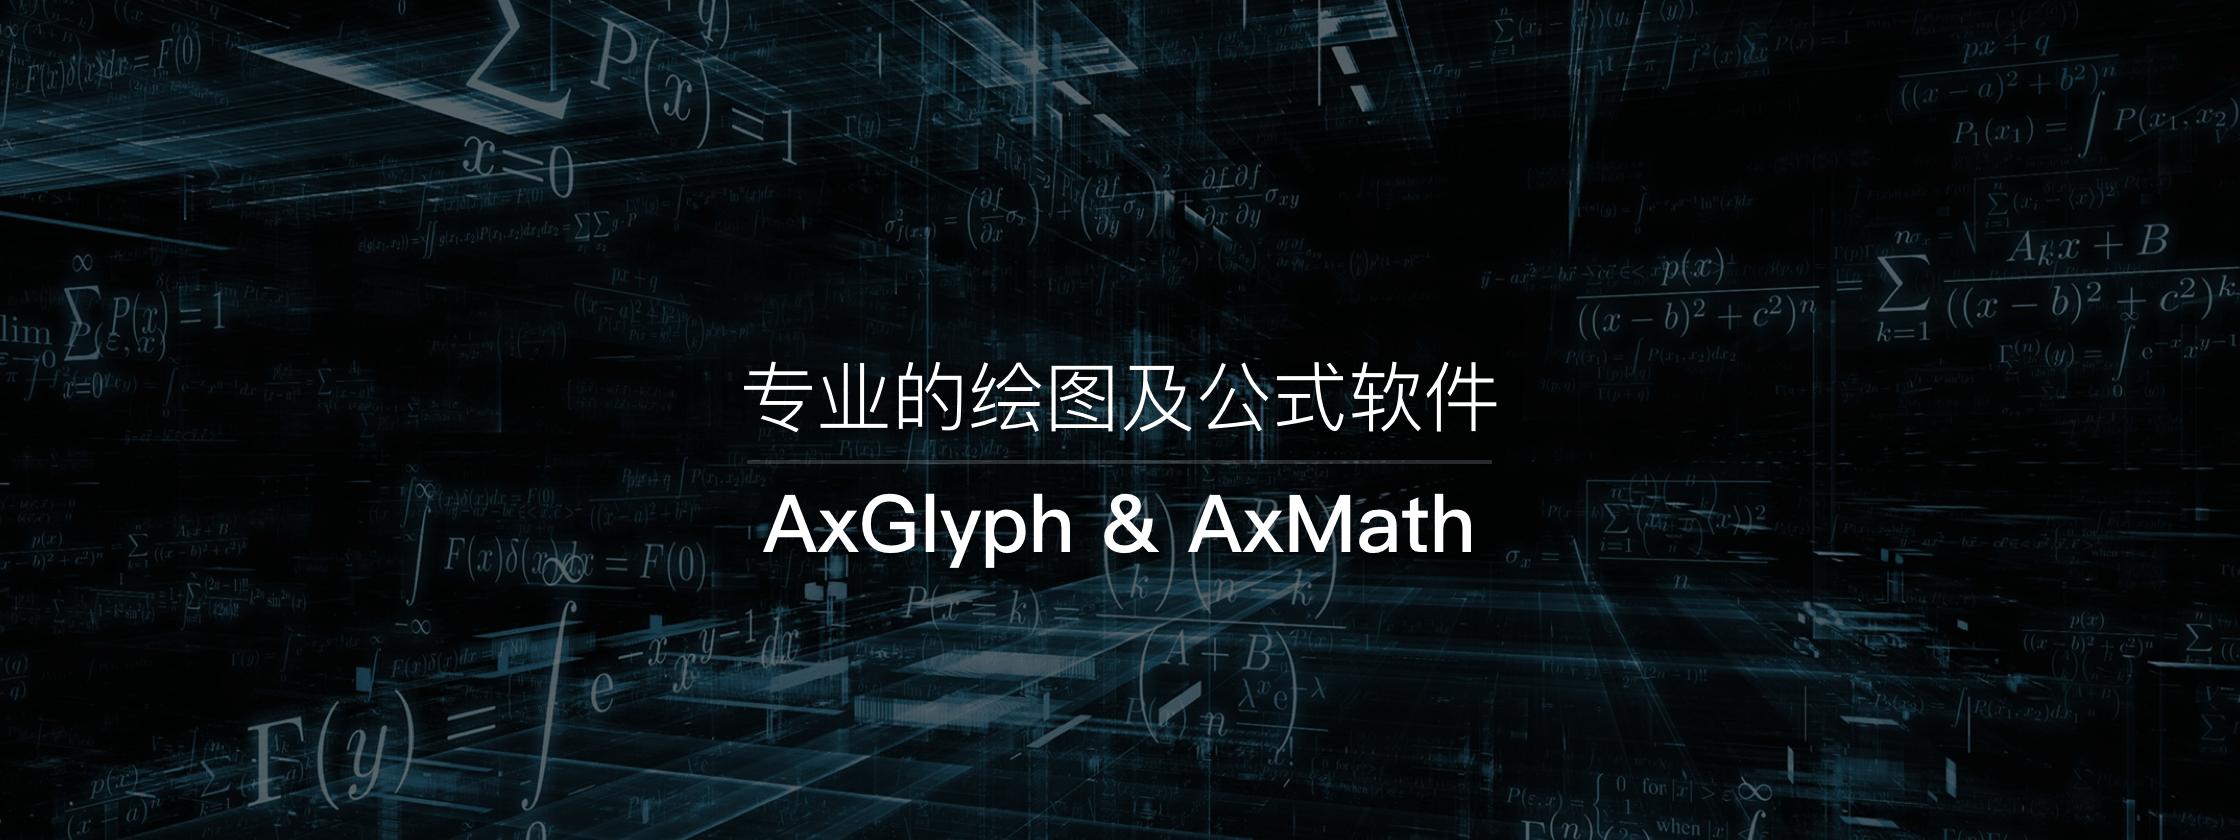 AxGlyph & AxMath – 专业的绘图及公式软件